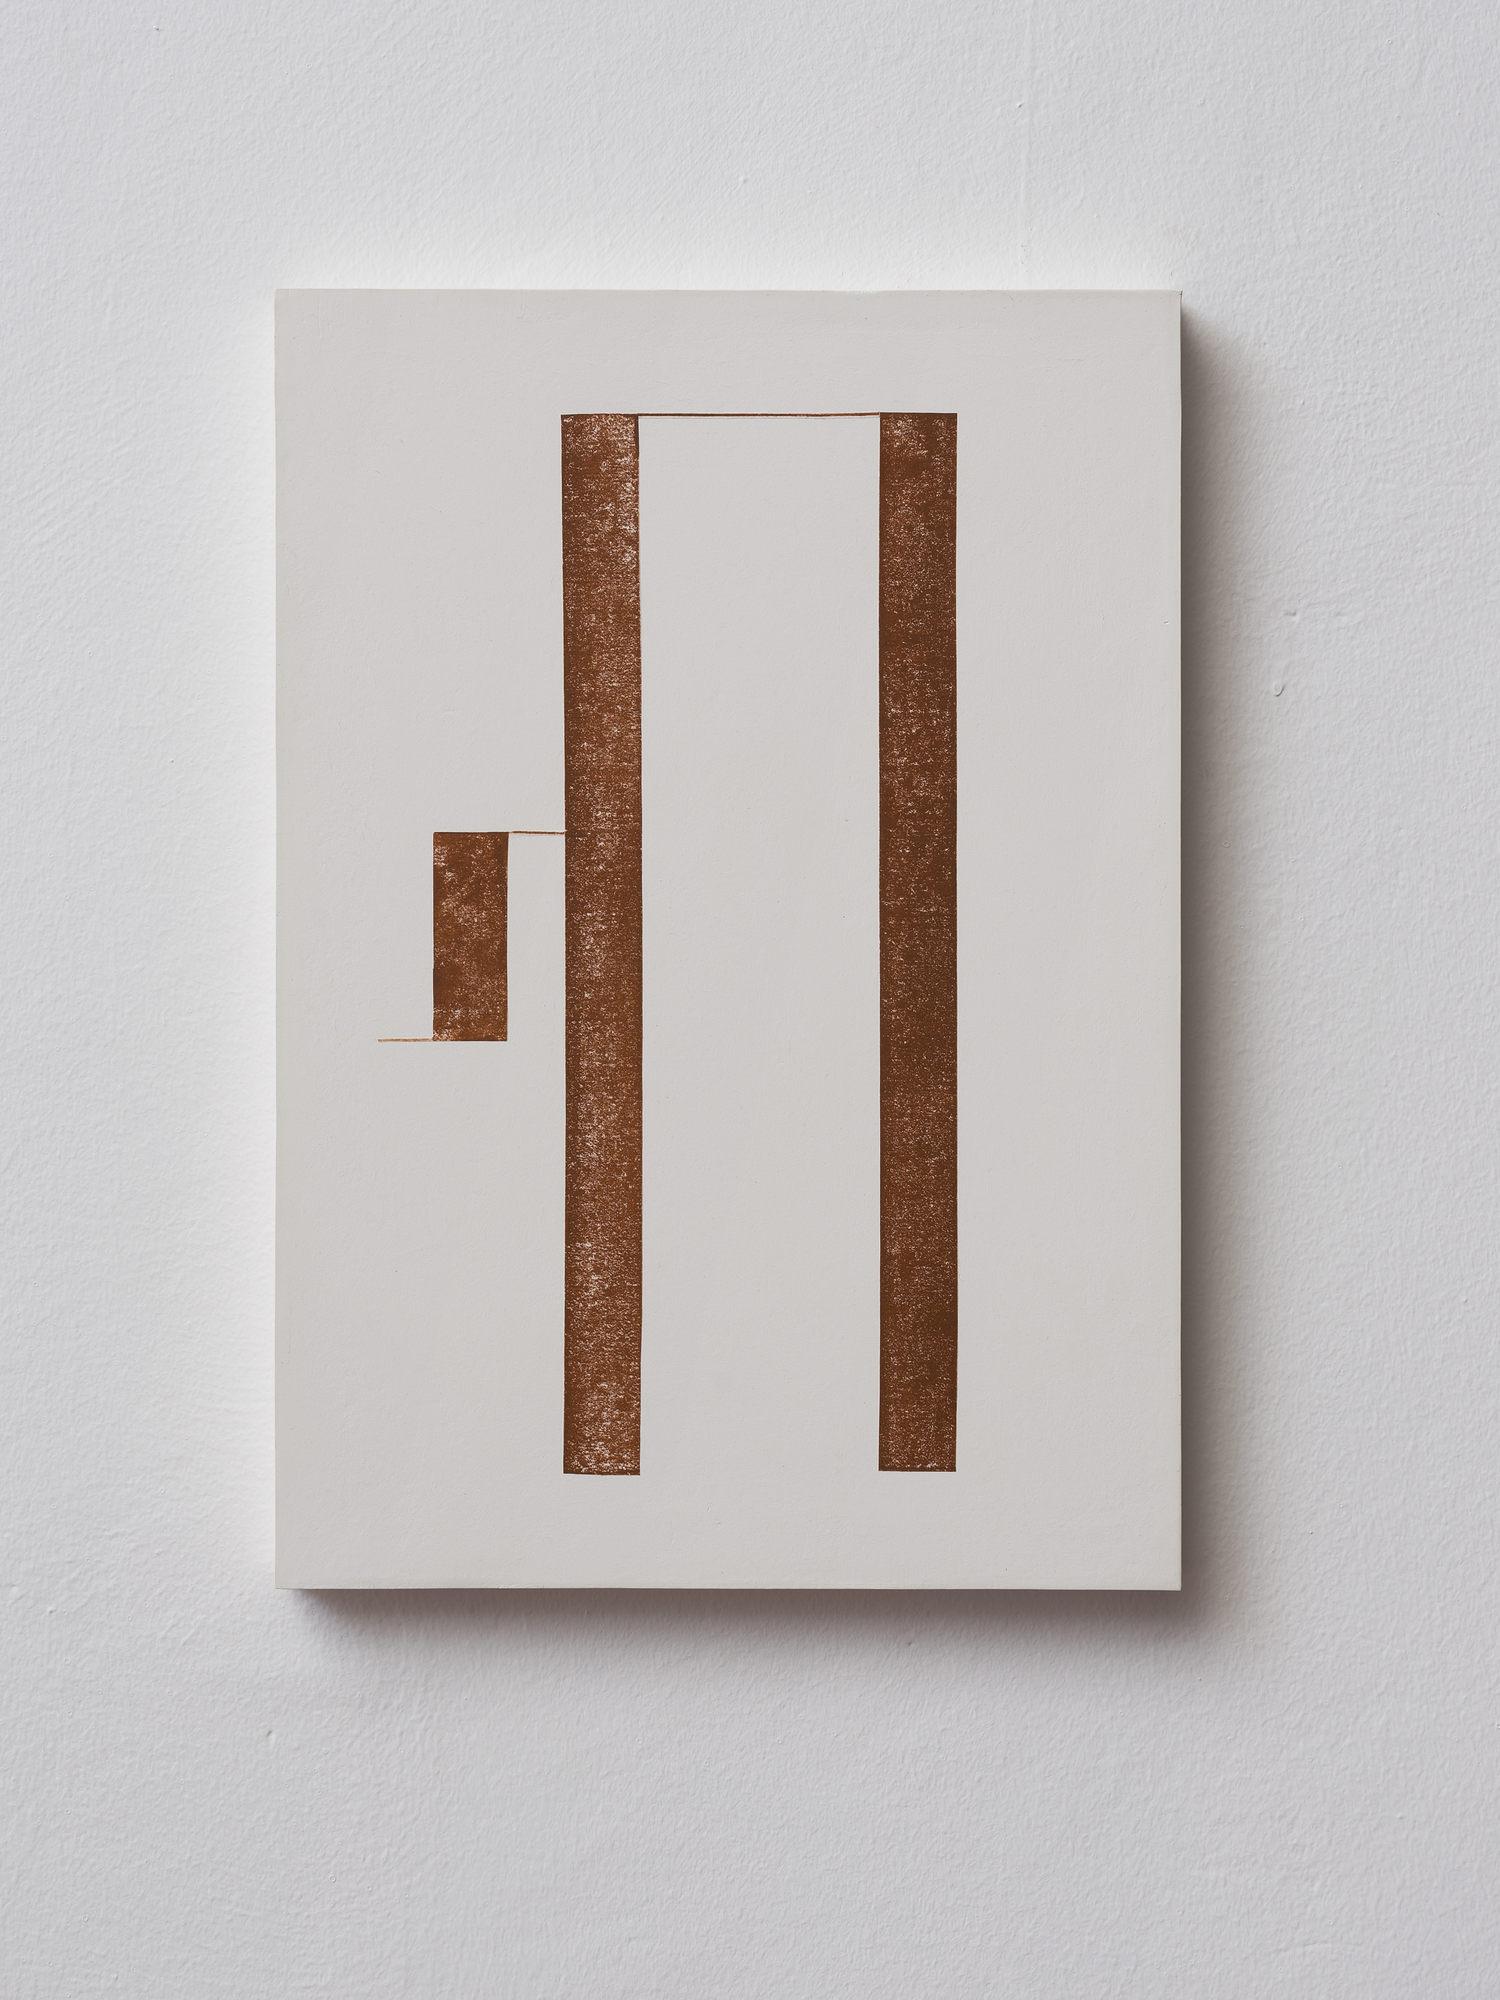 Florian Pumhösl, ዝናብ (Rain) - Third Letter, 2015, Collaged monotype print on plasterboard, 39.5 x 27.5 cm